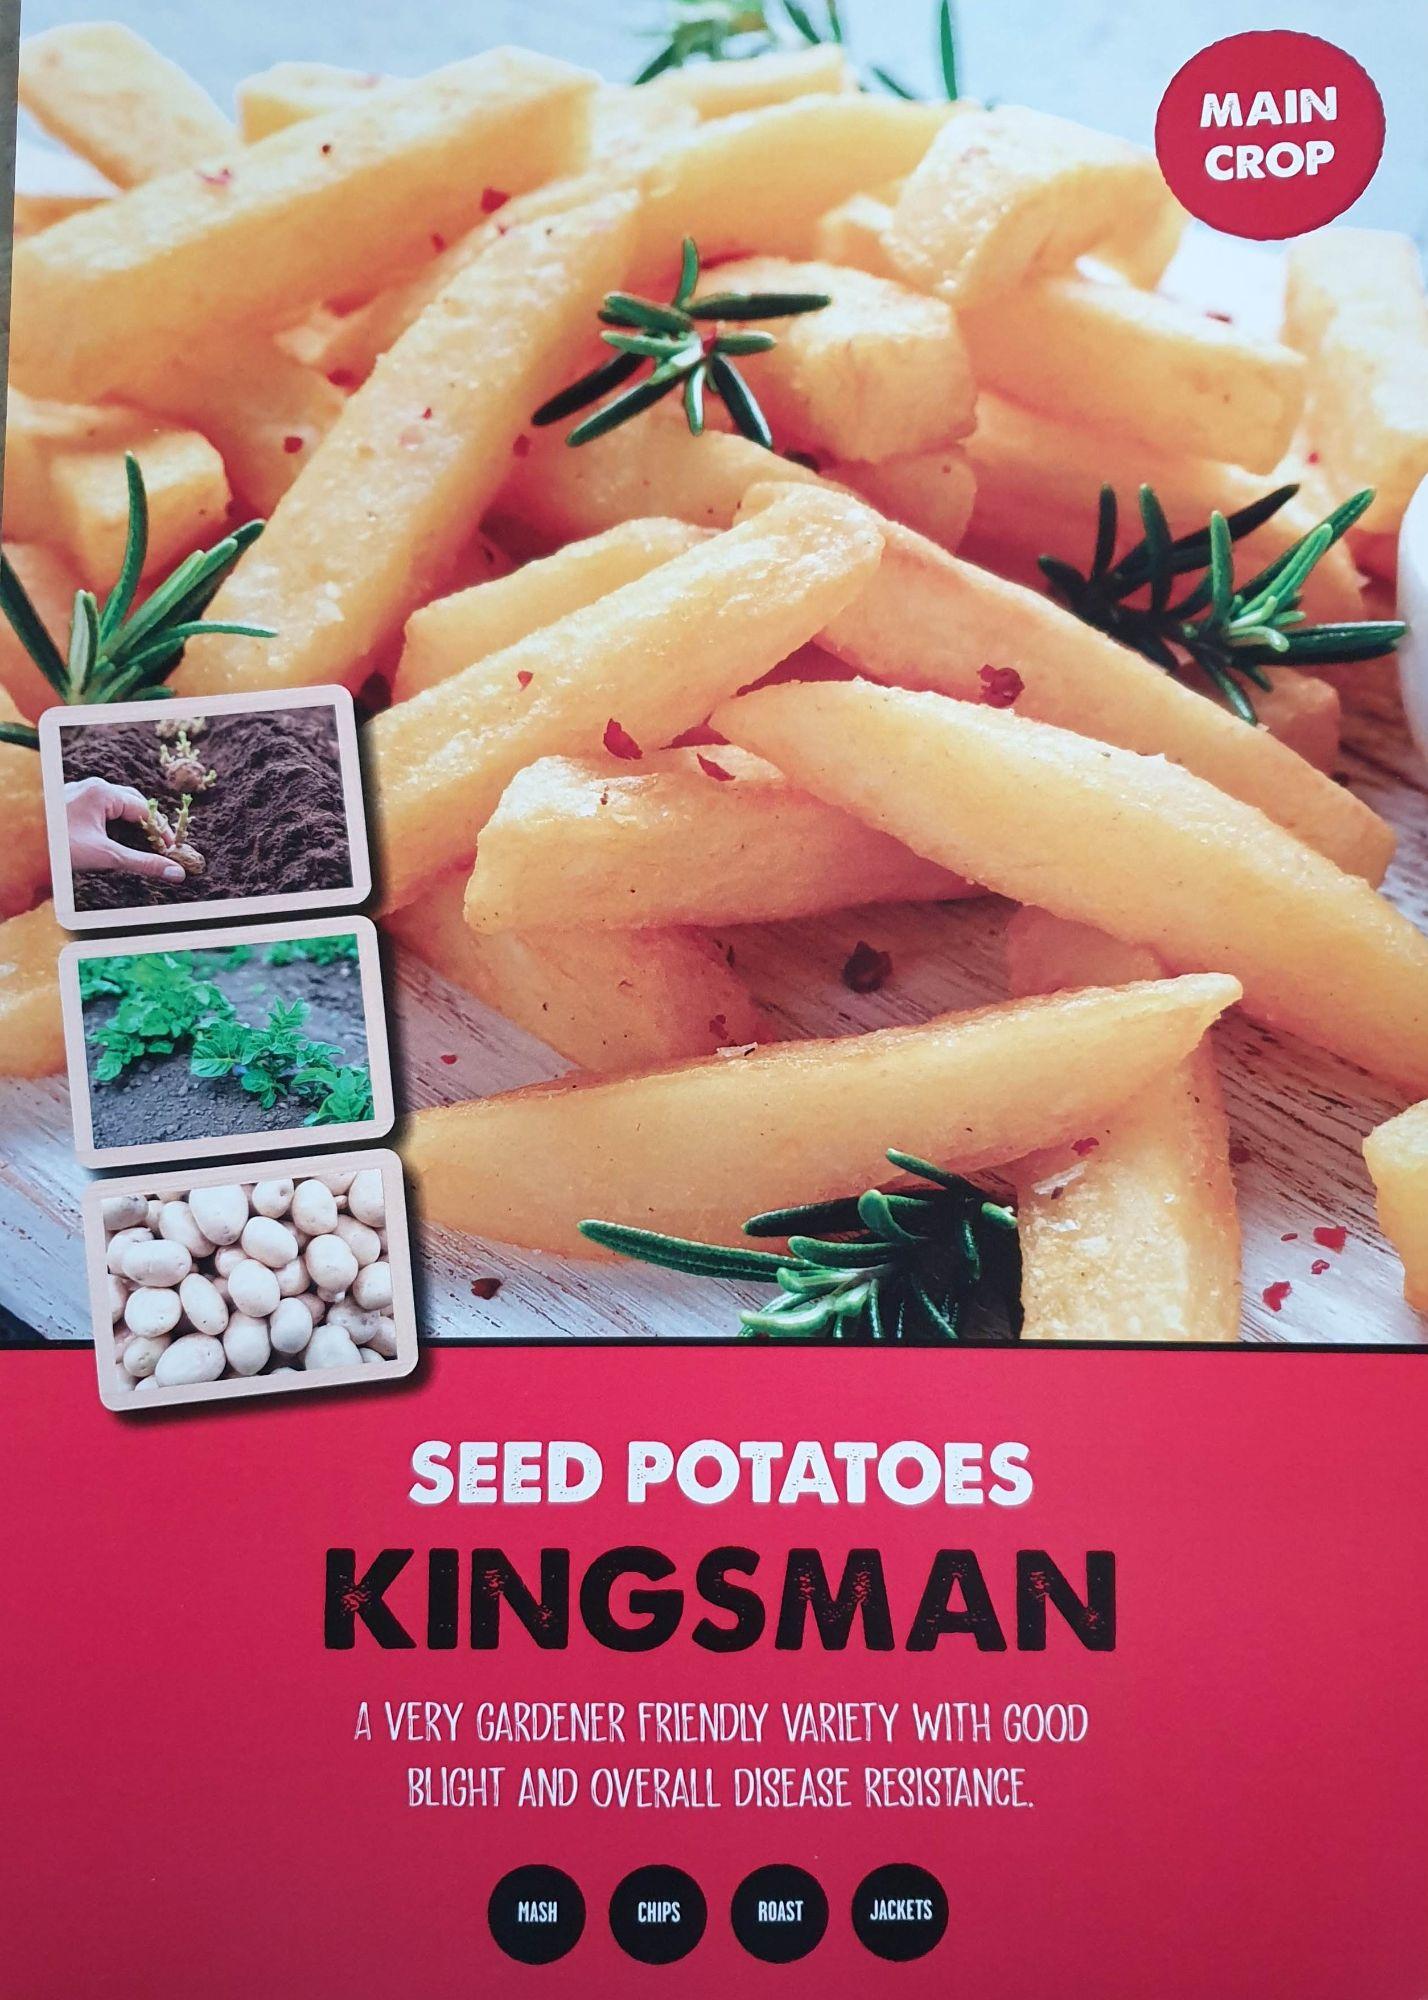 kingsman_seed_potato_info.jpg